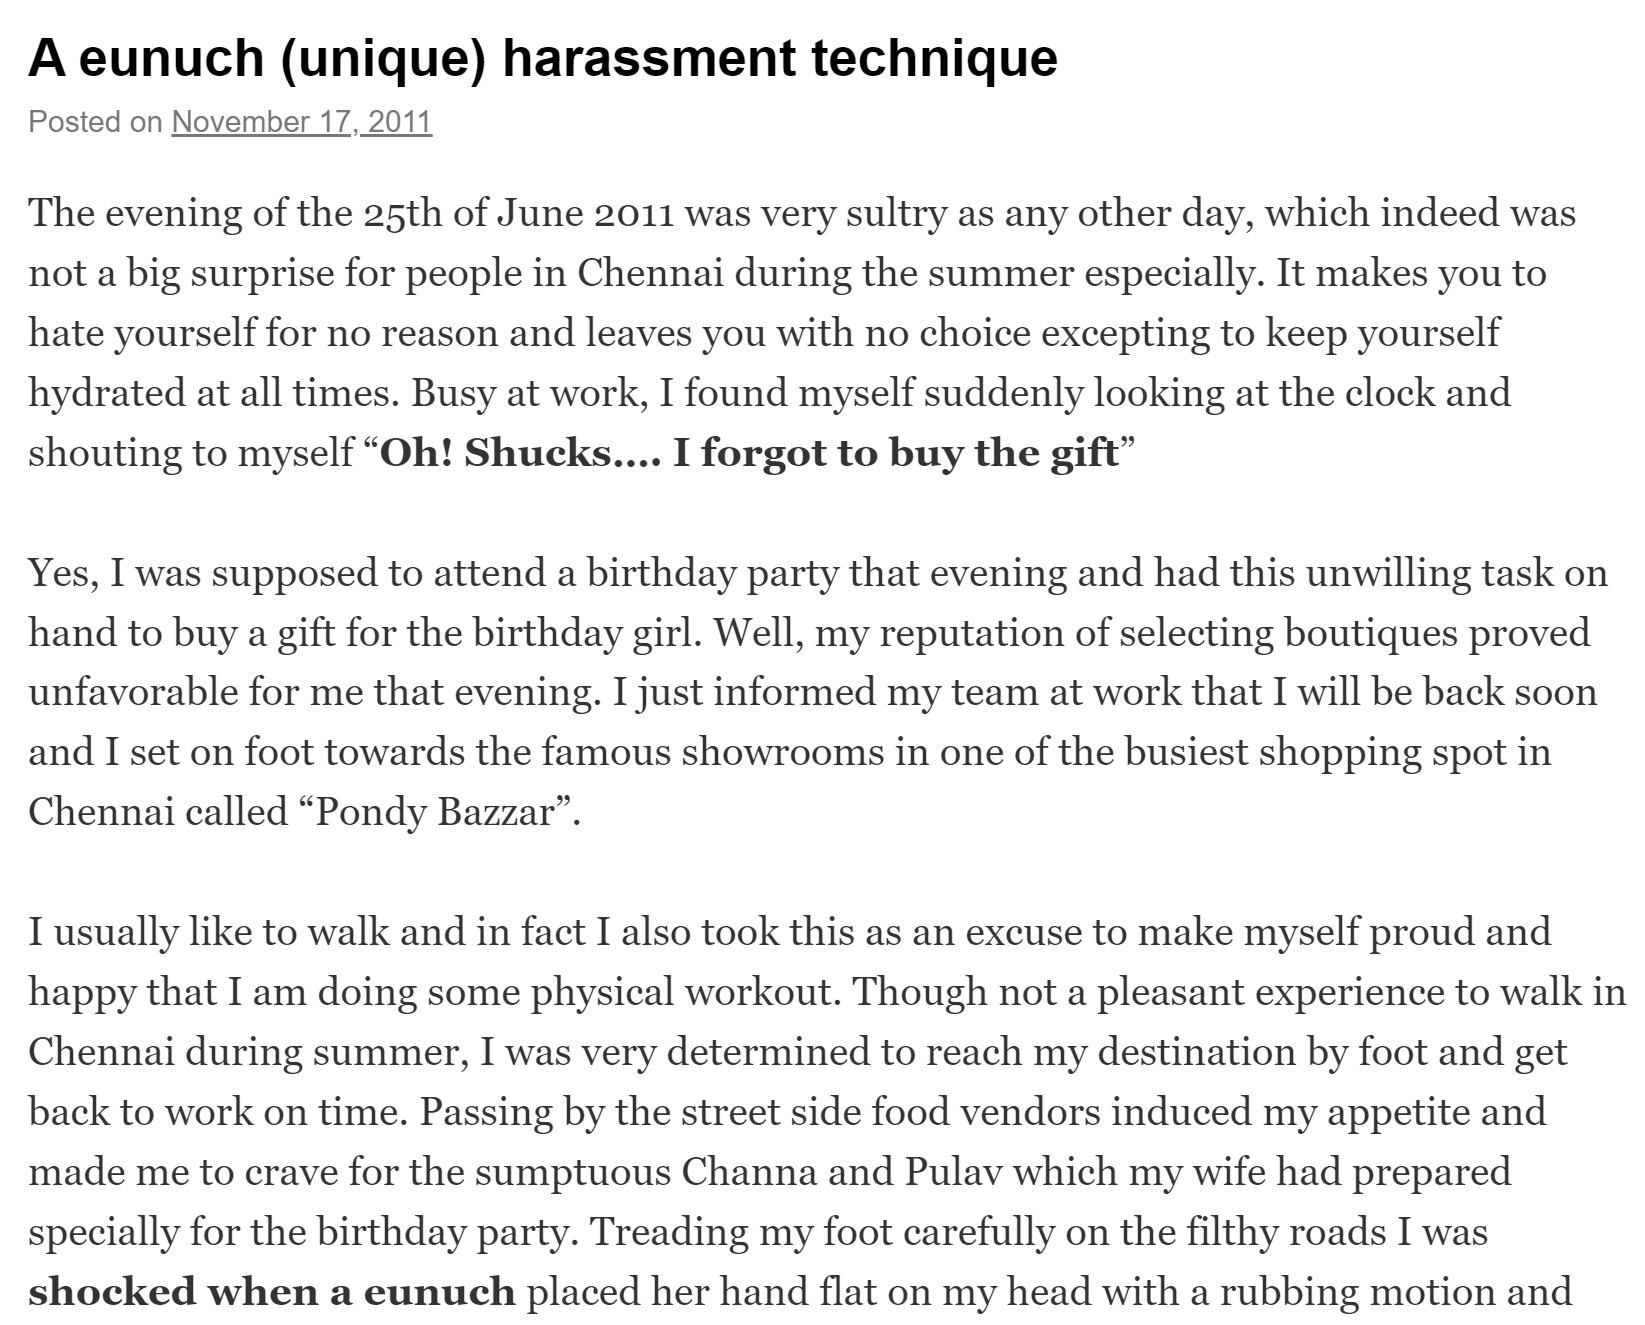 A eunuch experience